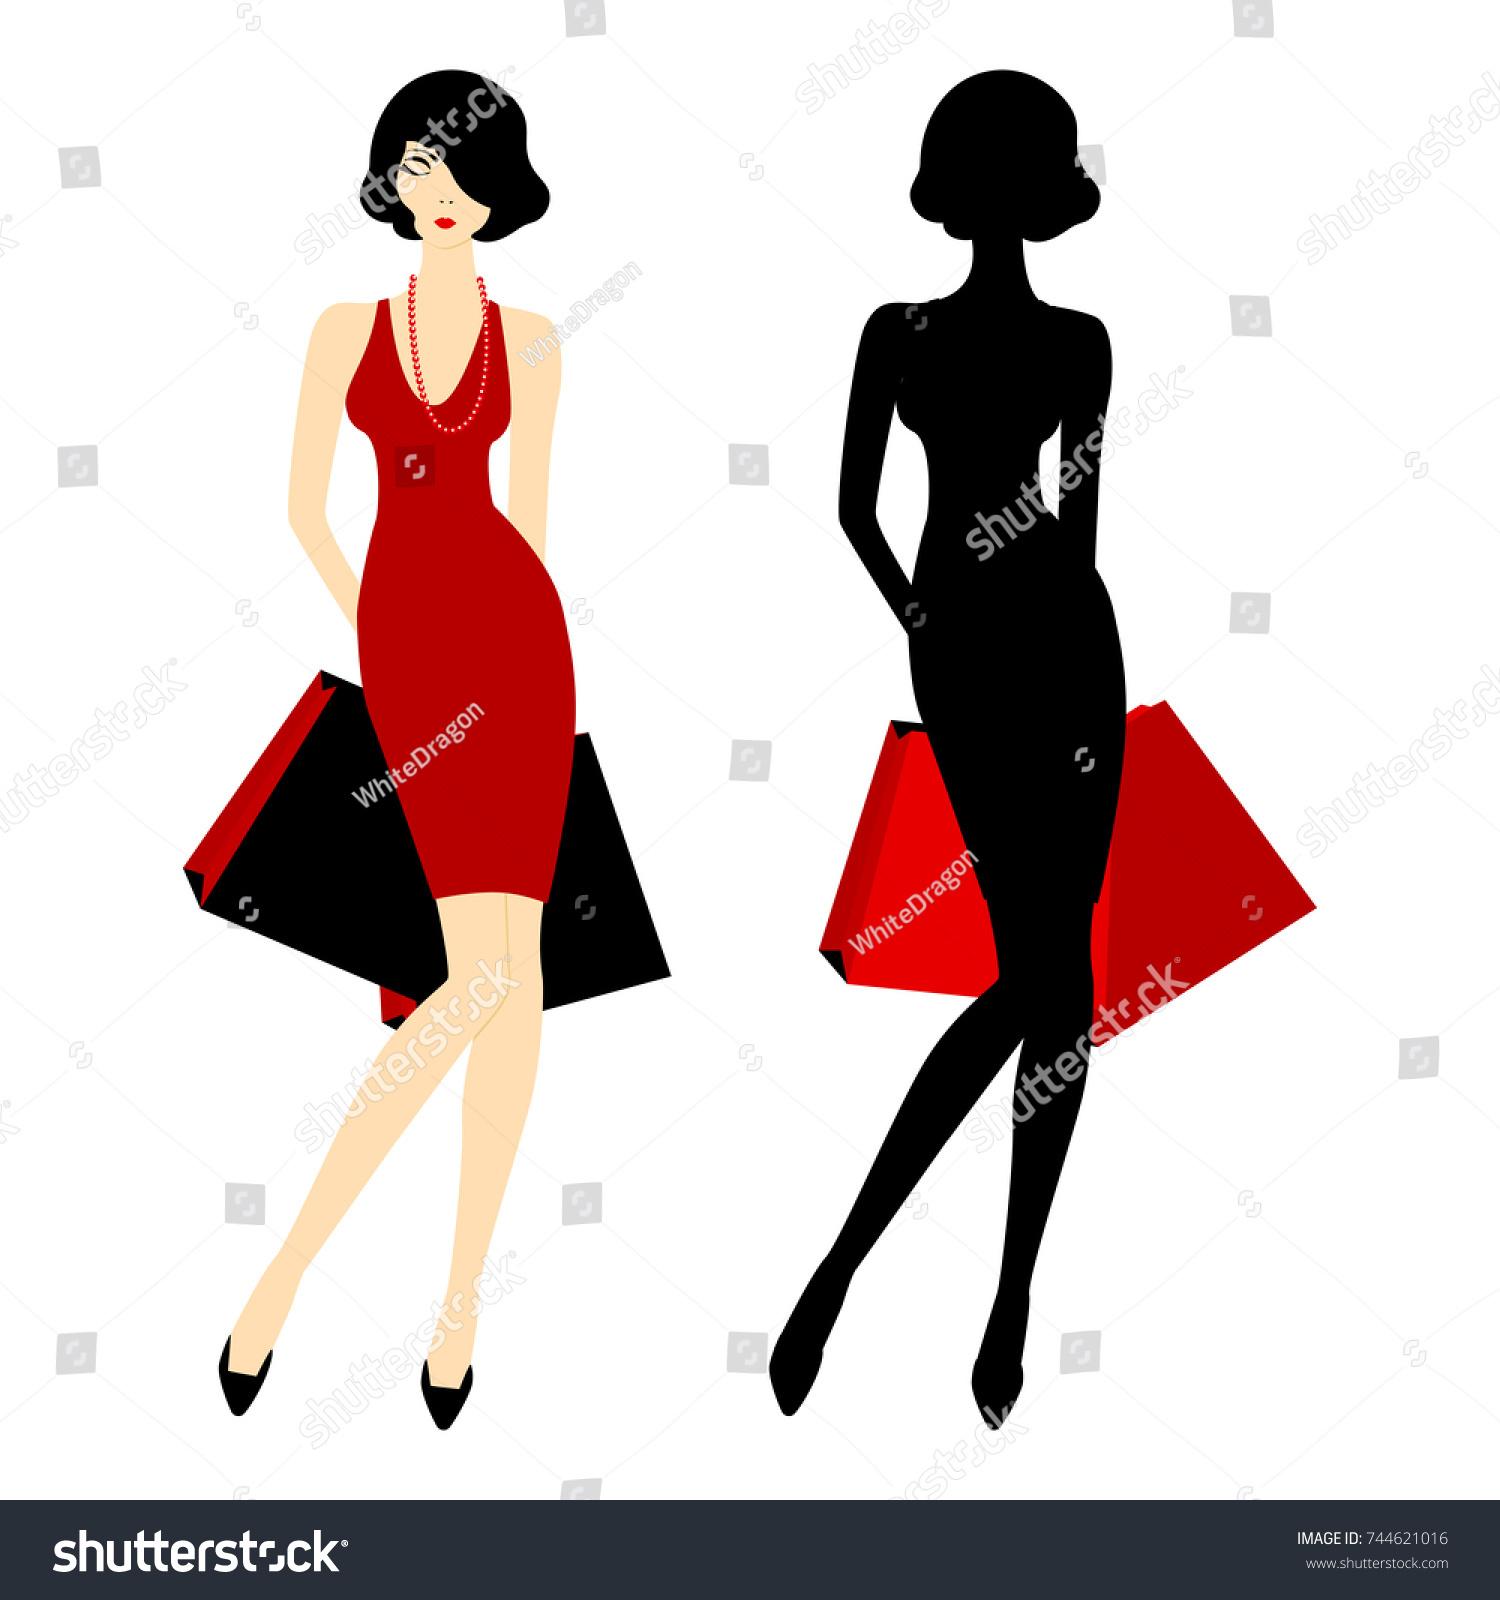 Poster Design Template Glamour Girl Figure Stock Vector Royalty